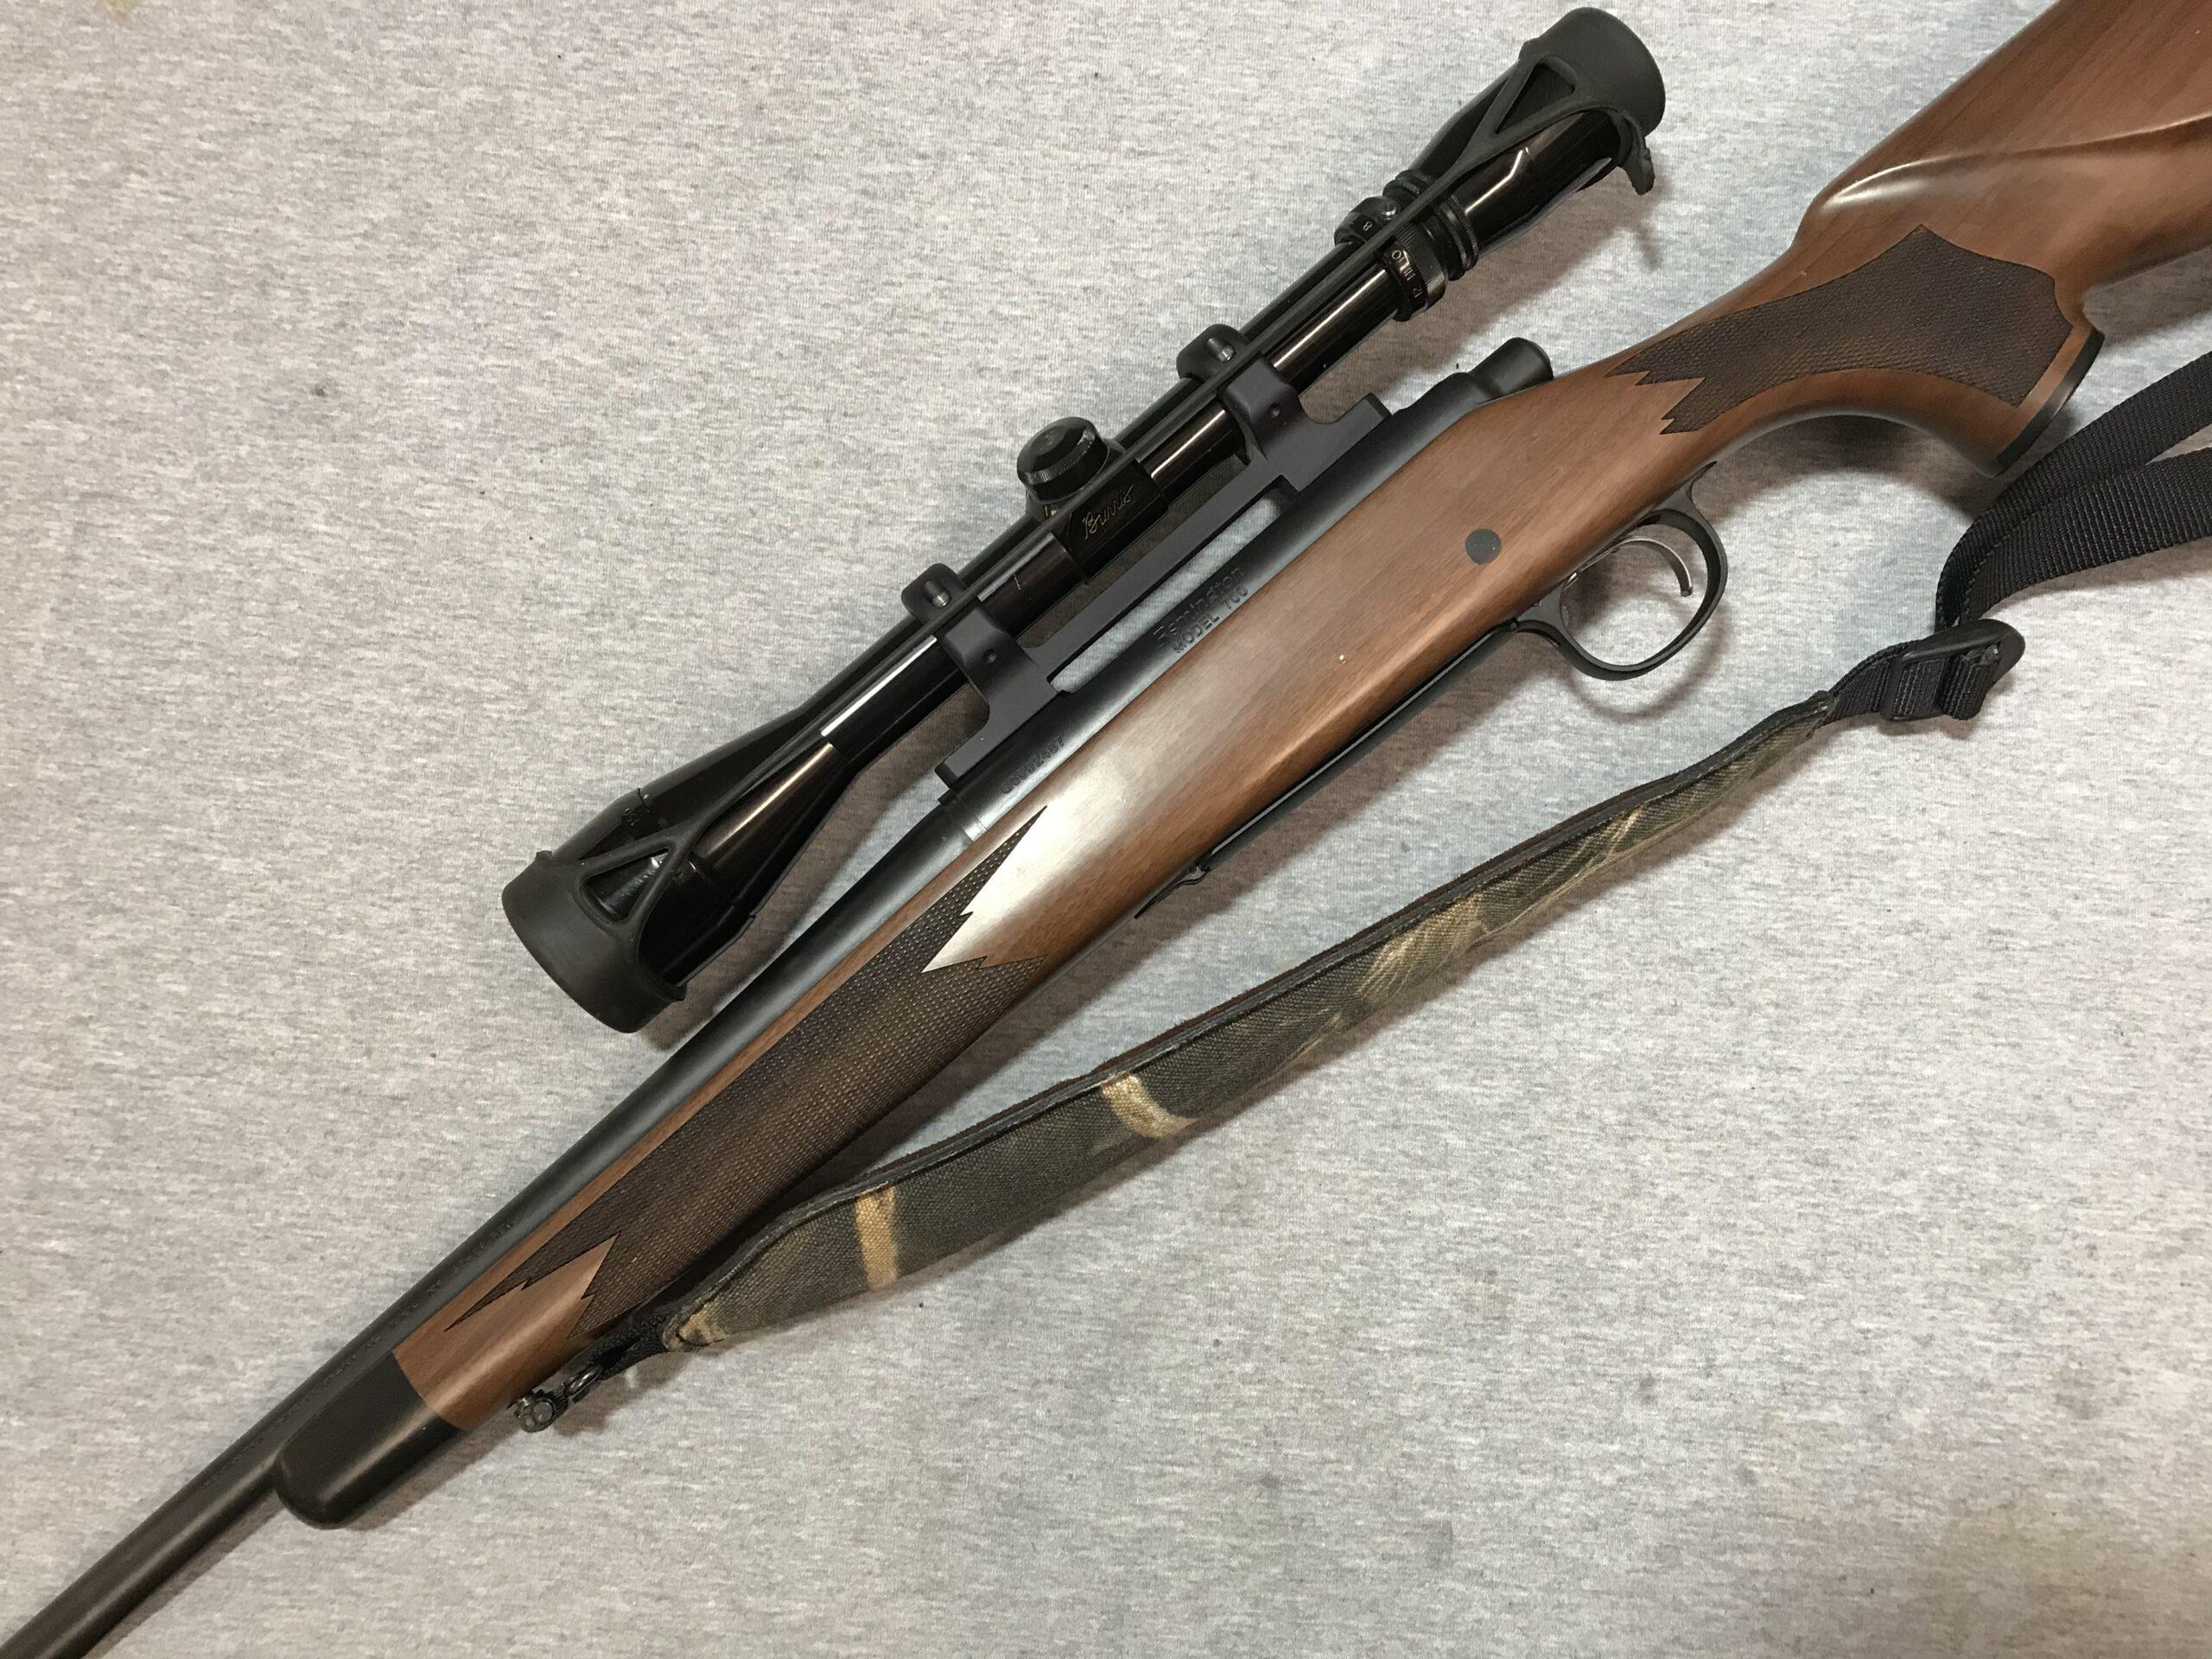 Remington CDL feature angle